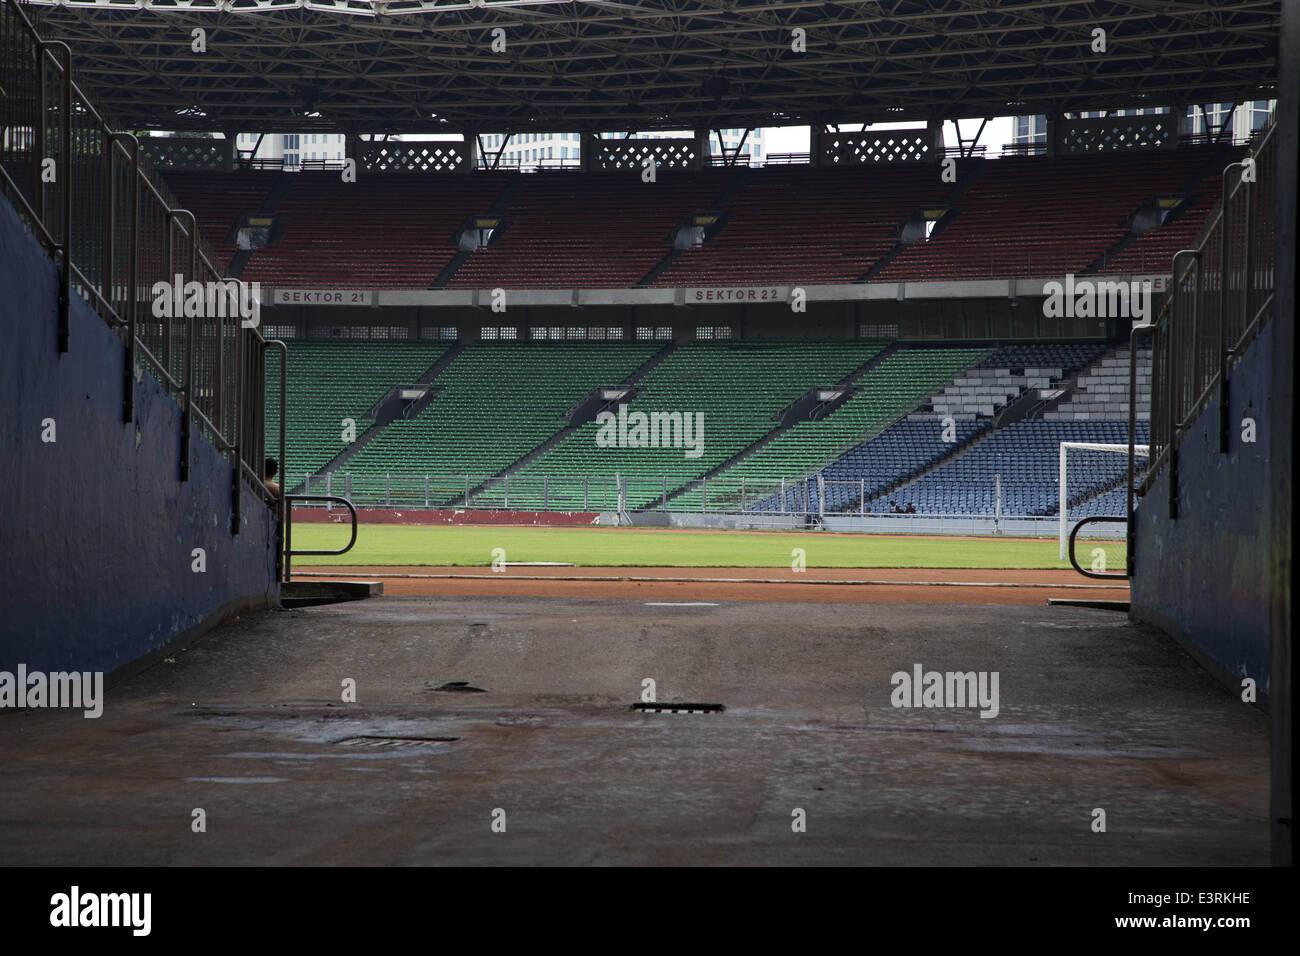 Jakarta International Stadium Image: Bung Karno Stock Photos & Bung Karno Stock Images